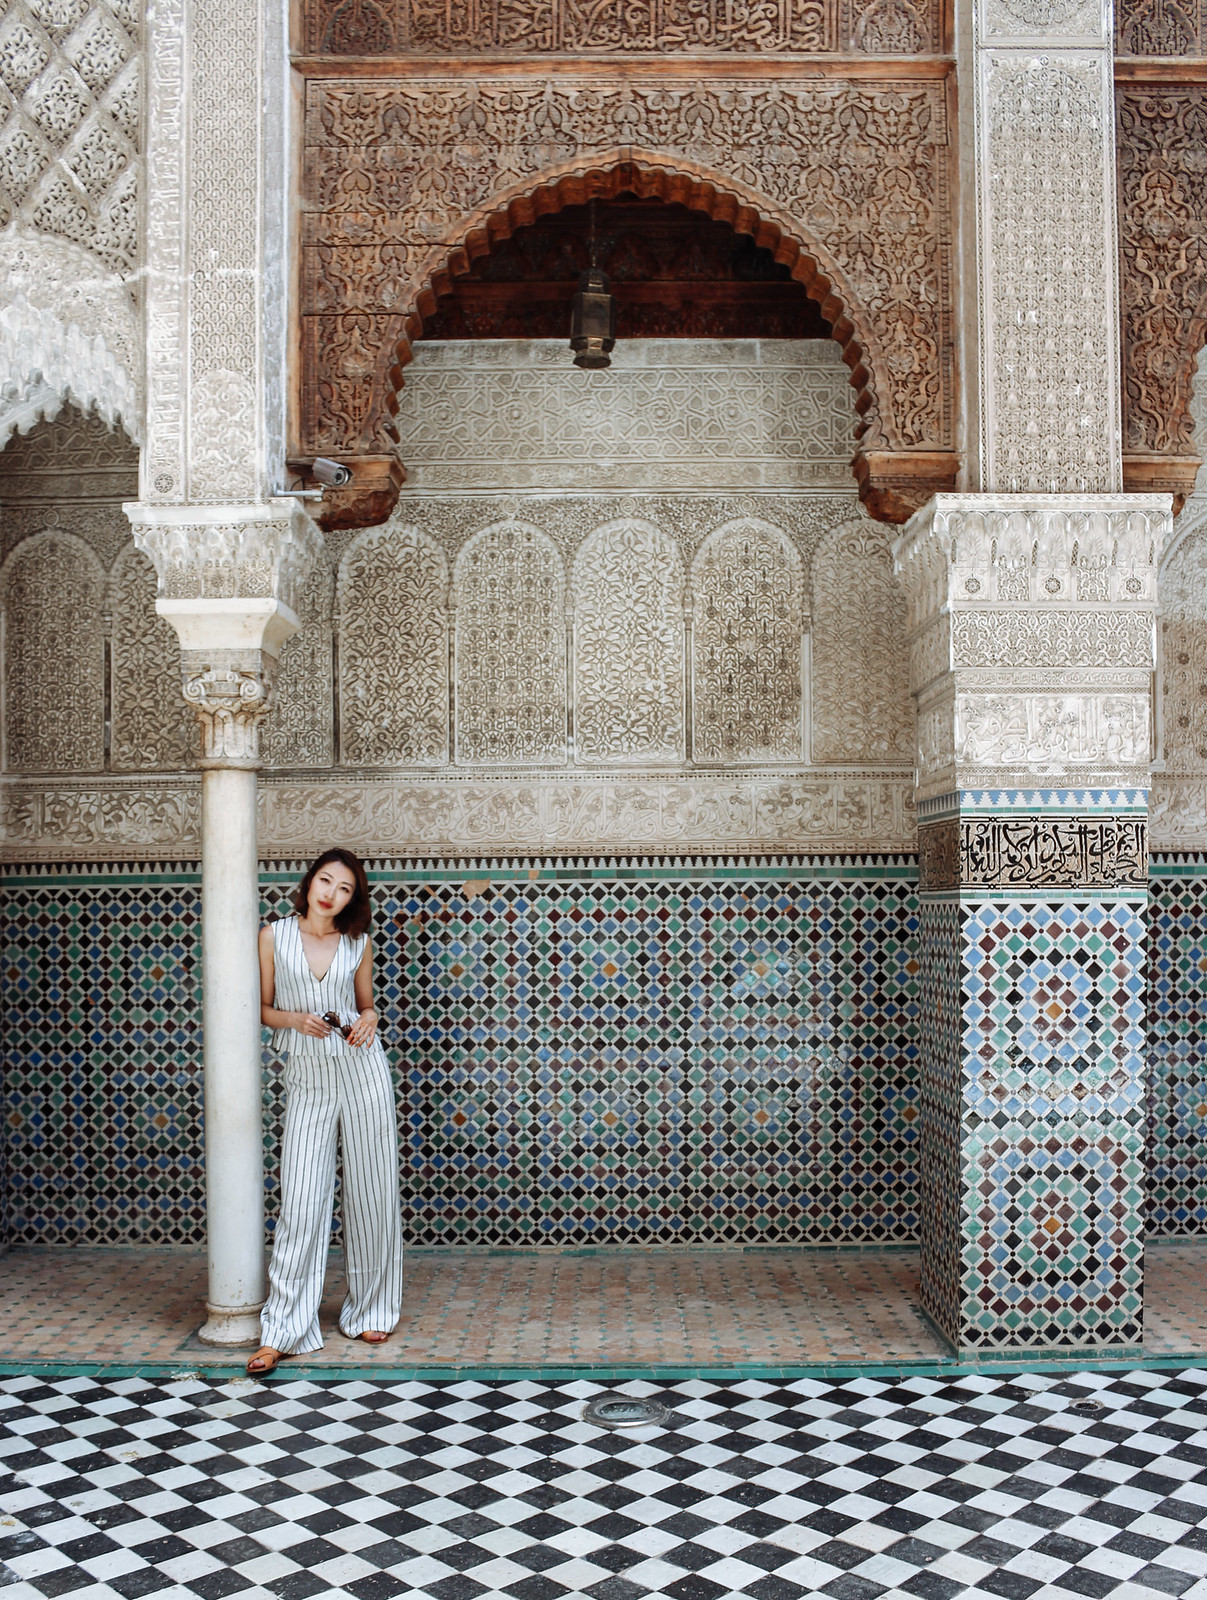 Fes Morocco - kisses,vera-24